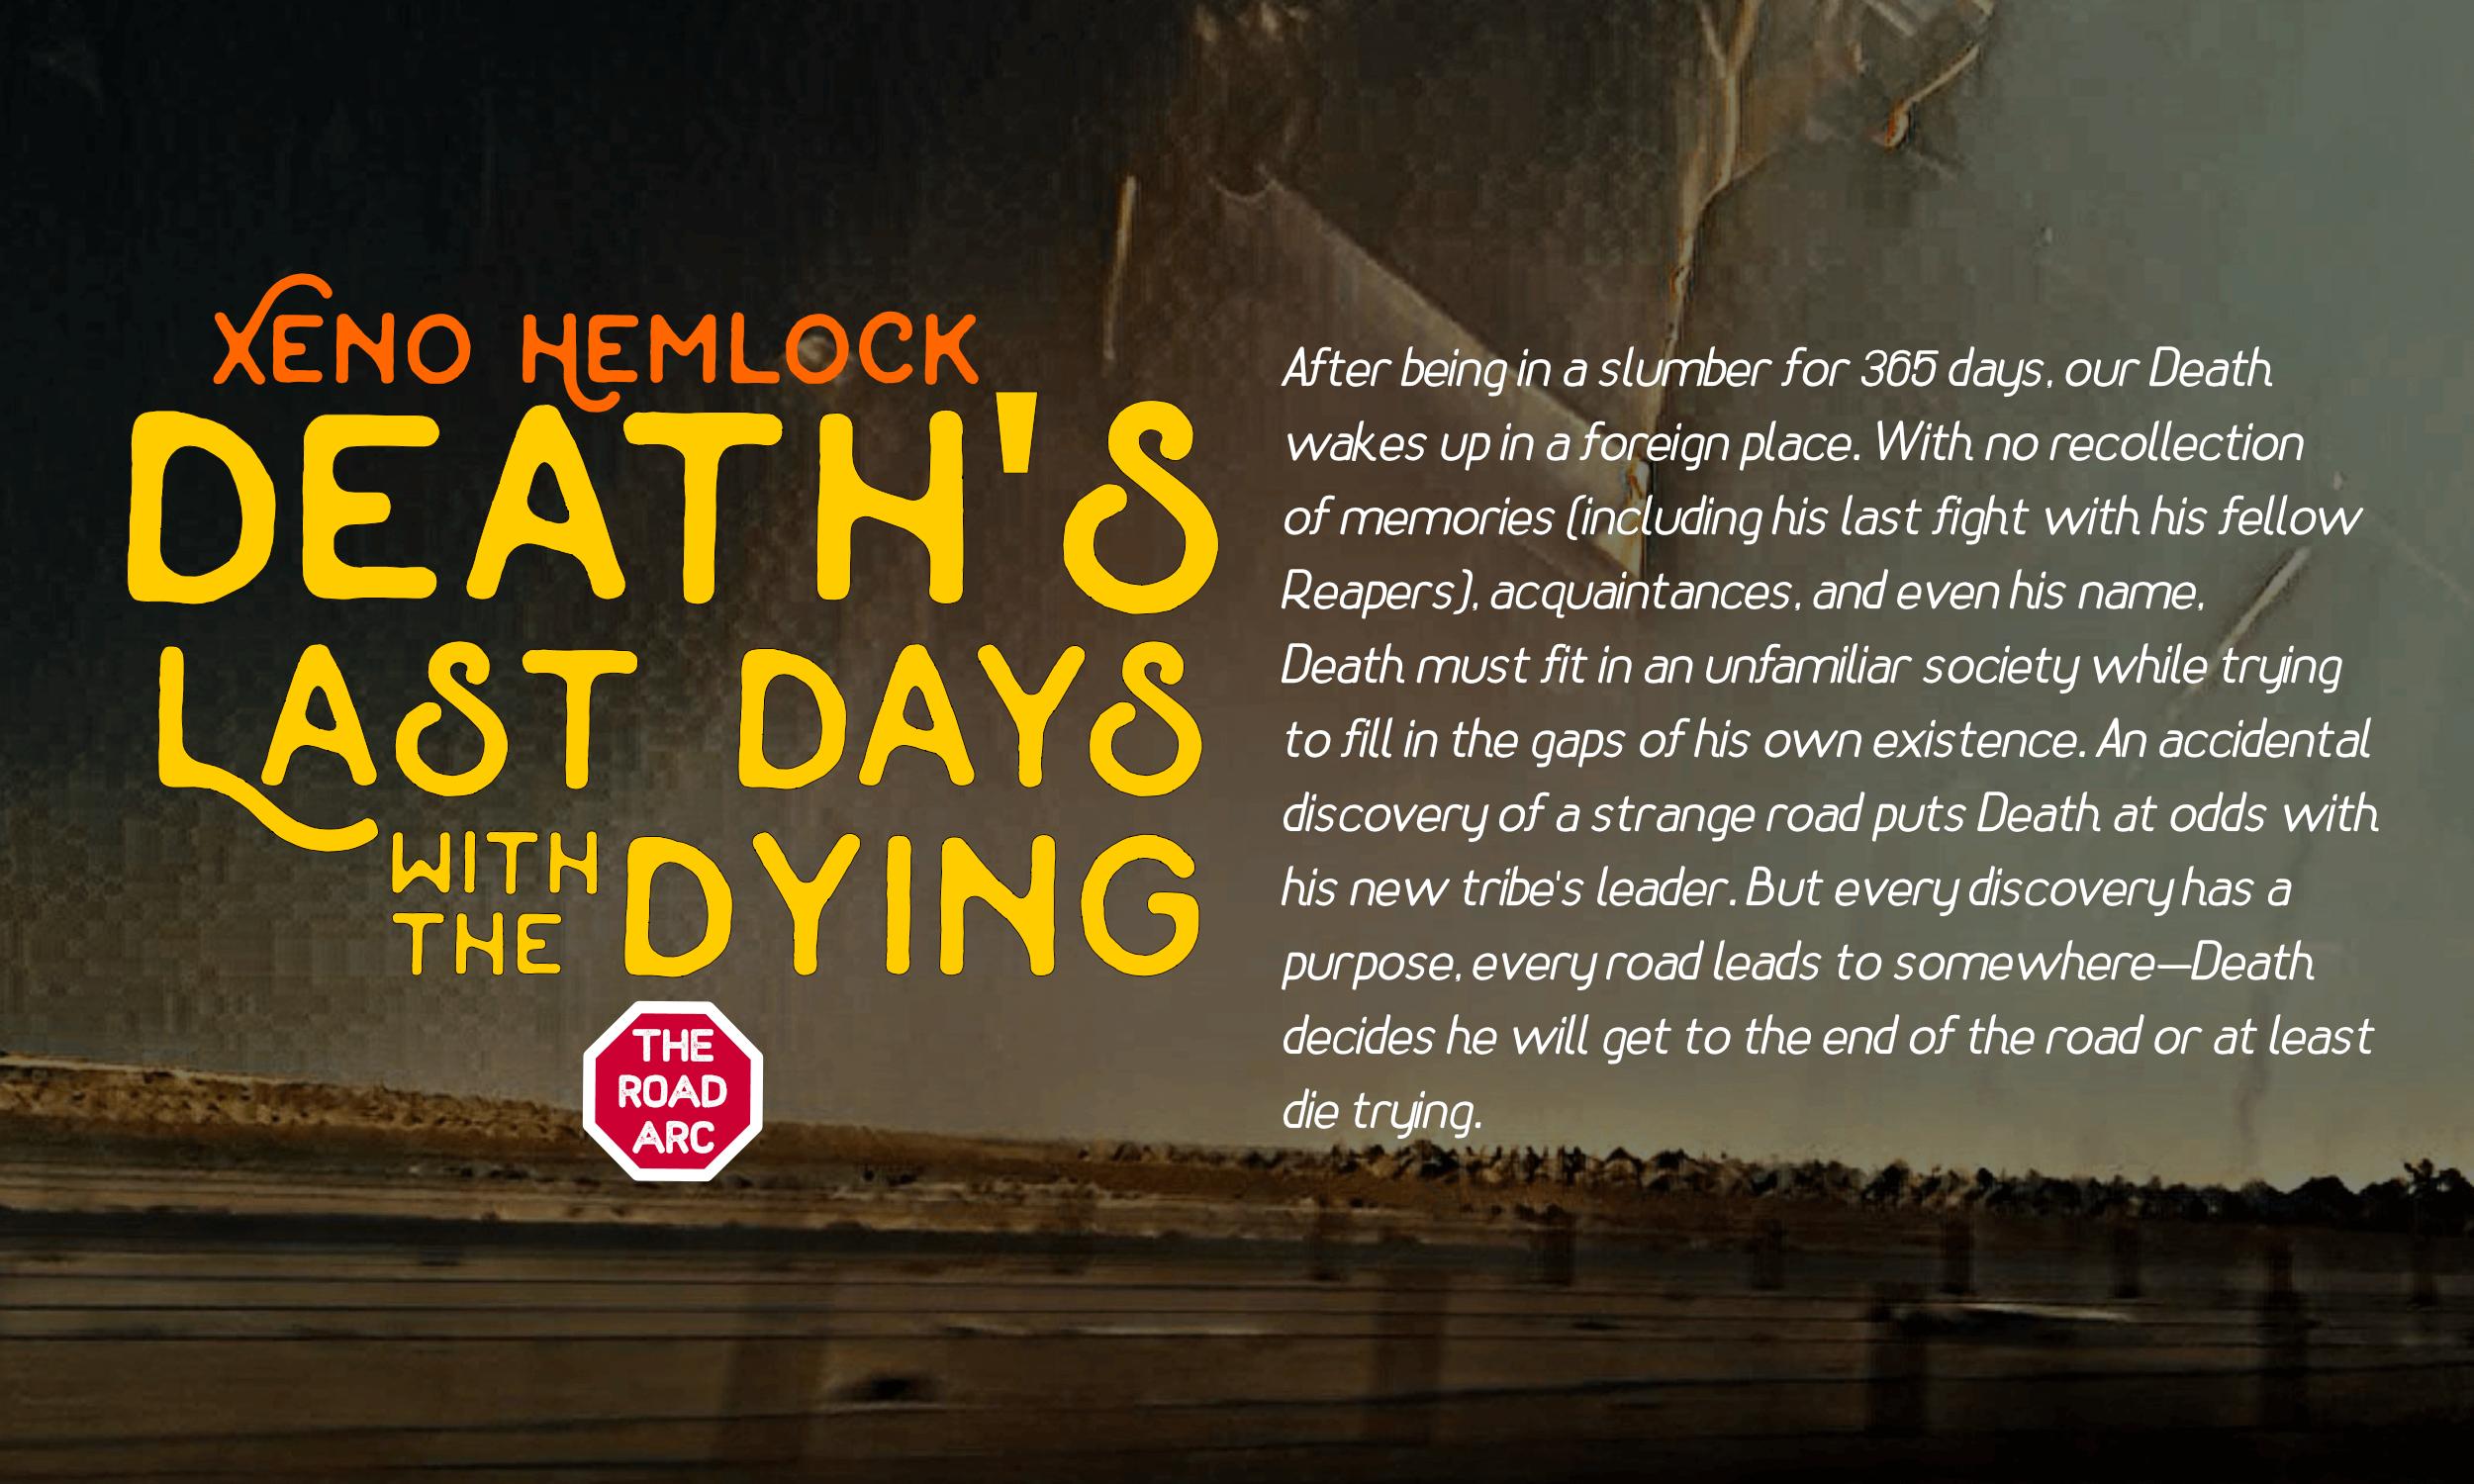 Road Arc Xeno Hemlock Death Last Days Dying.png